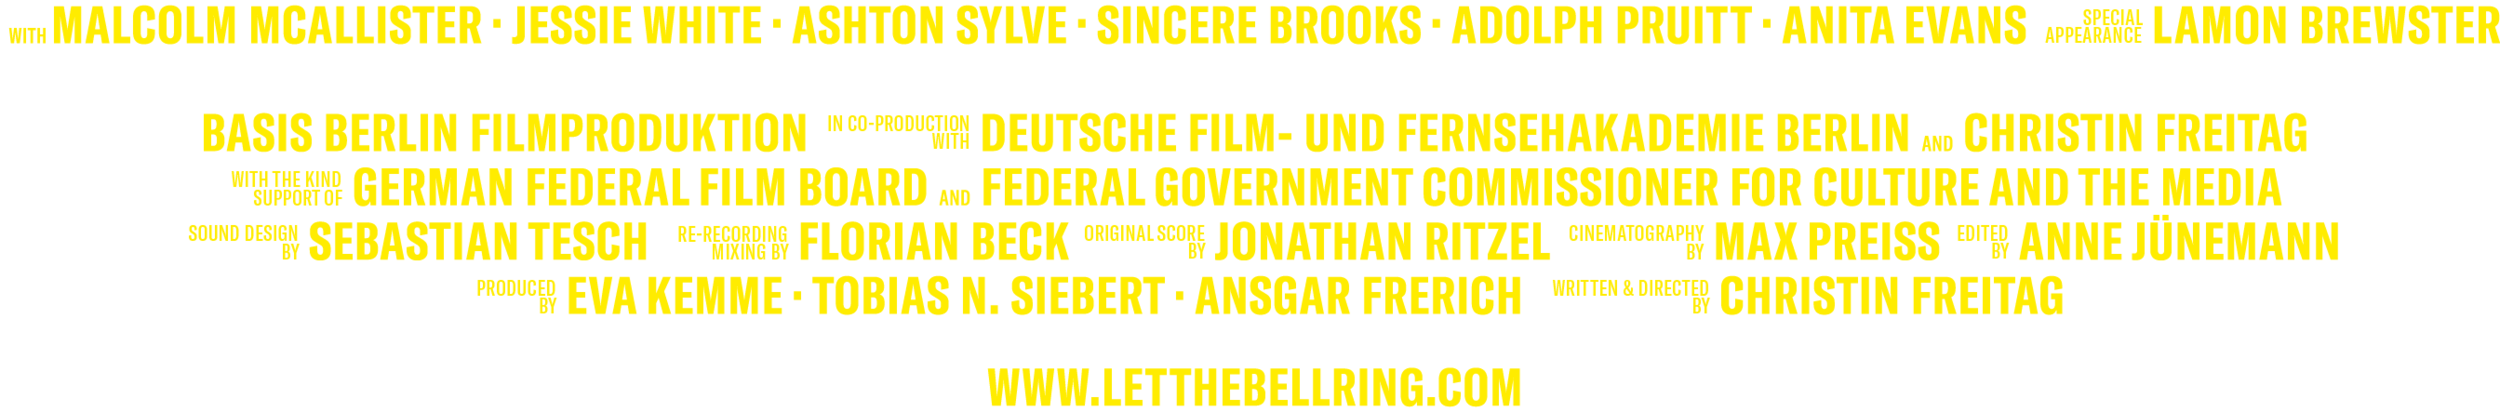 ltbr_billing block.png